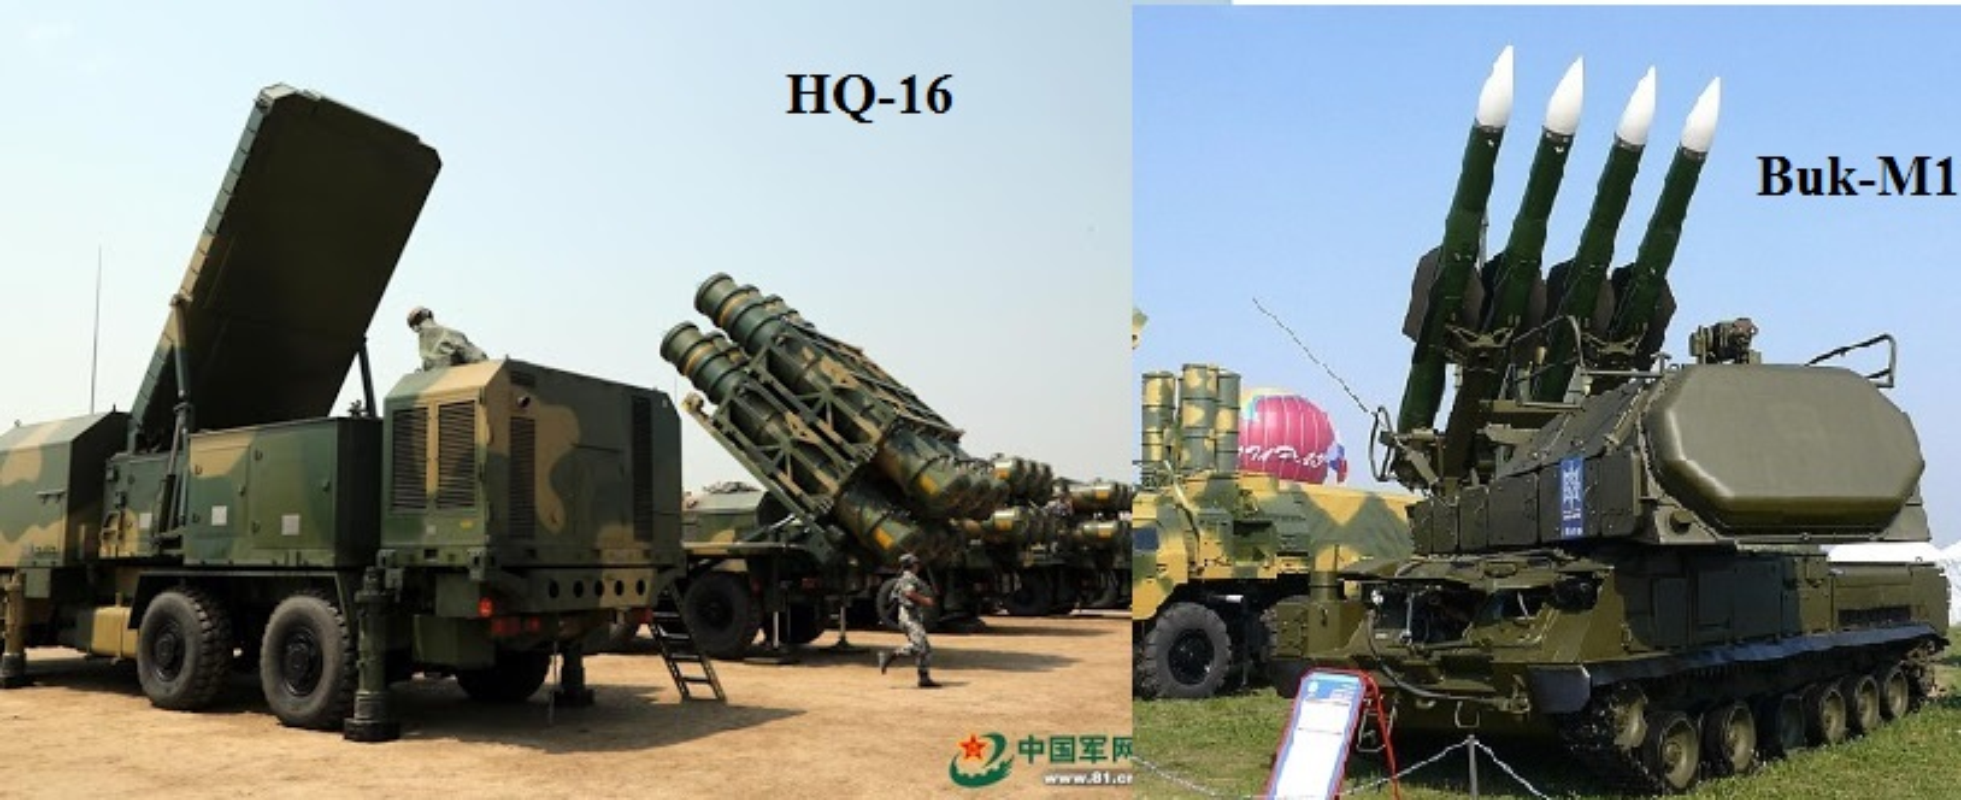 Ten lua Hong Ky-16 phai chang la phien ban Buk kieu Trung Quoc?-Hinh-16